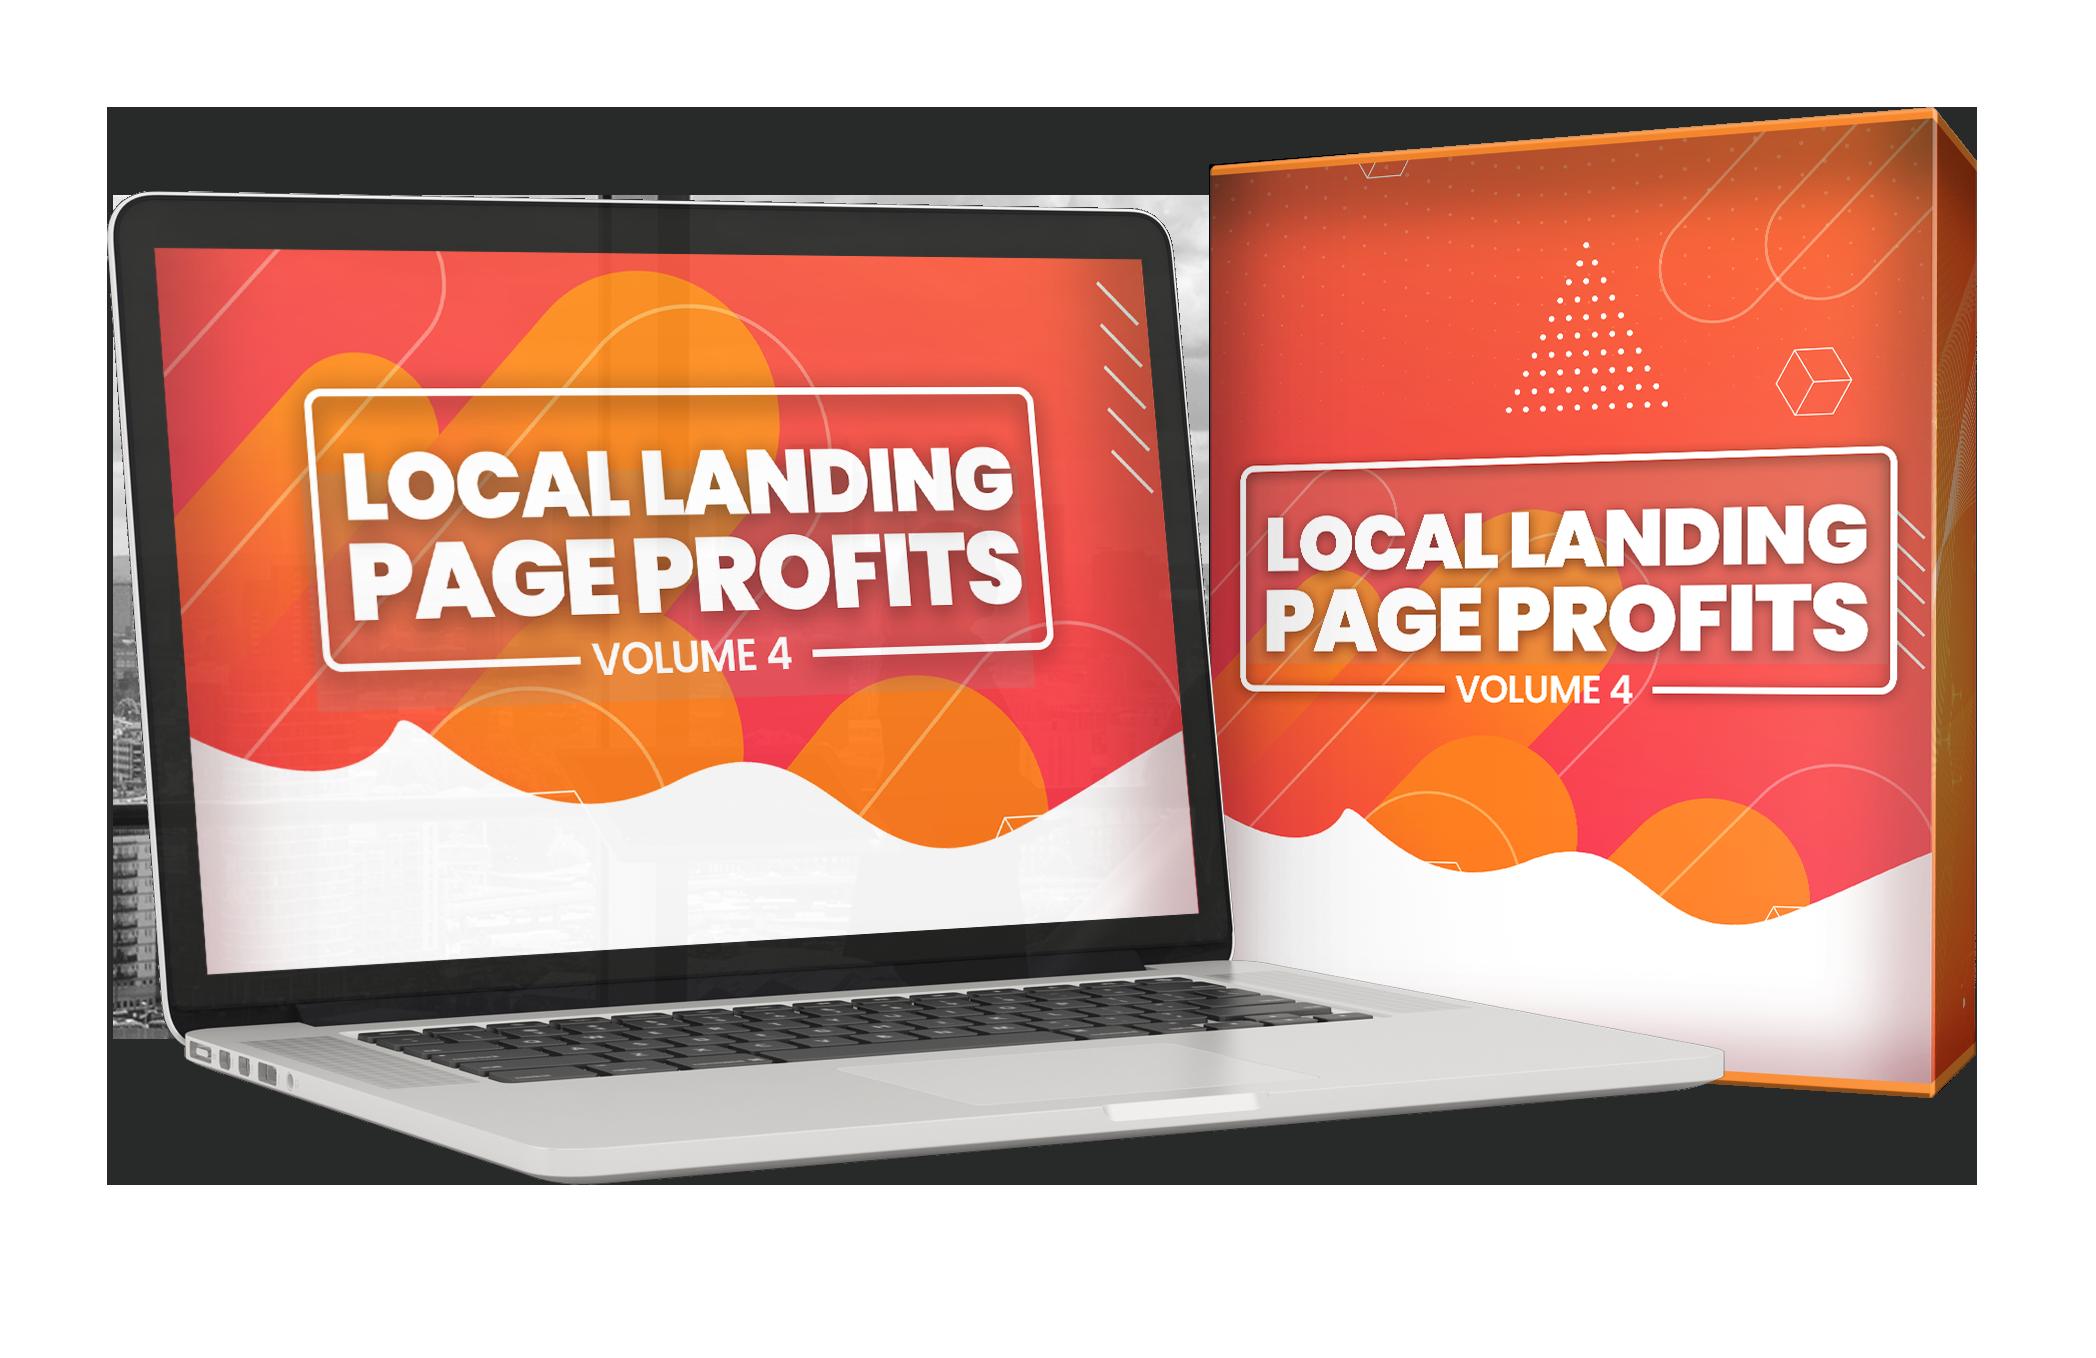 Local Landing Page Profits Vol4 (FE) + Local Landing Page Profits Pro Vol4 (OTO1) + Local Landing Page Profits Premium Vol4 (OTO2)